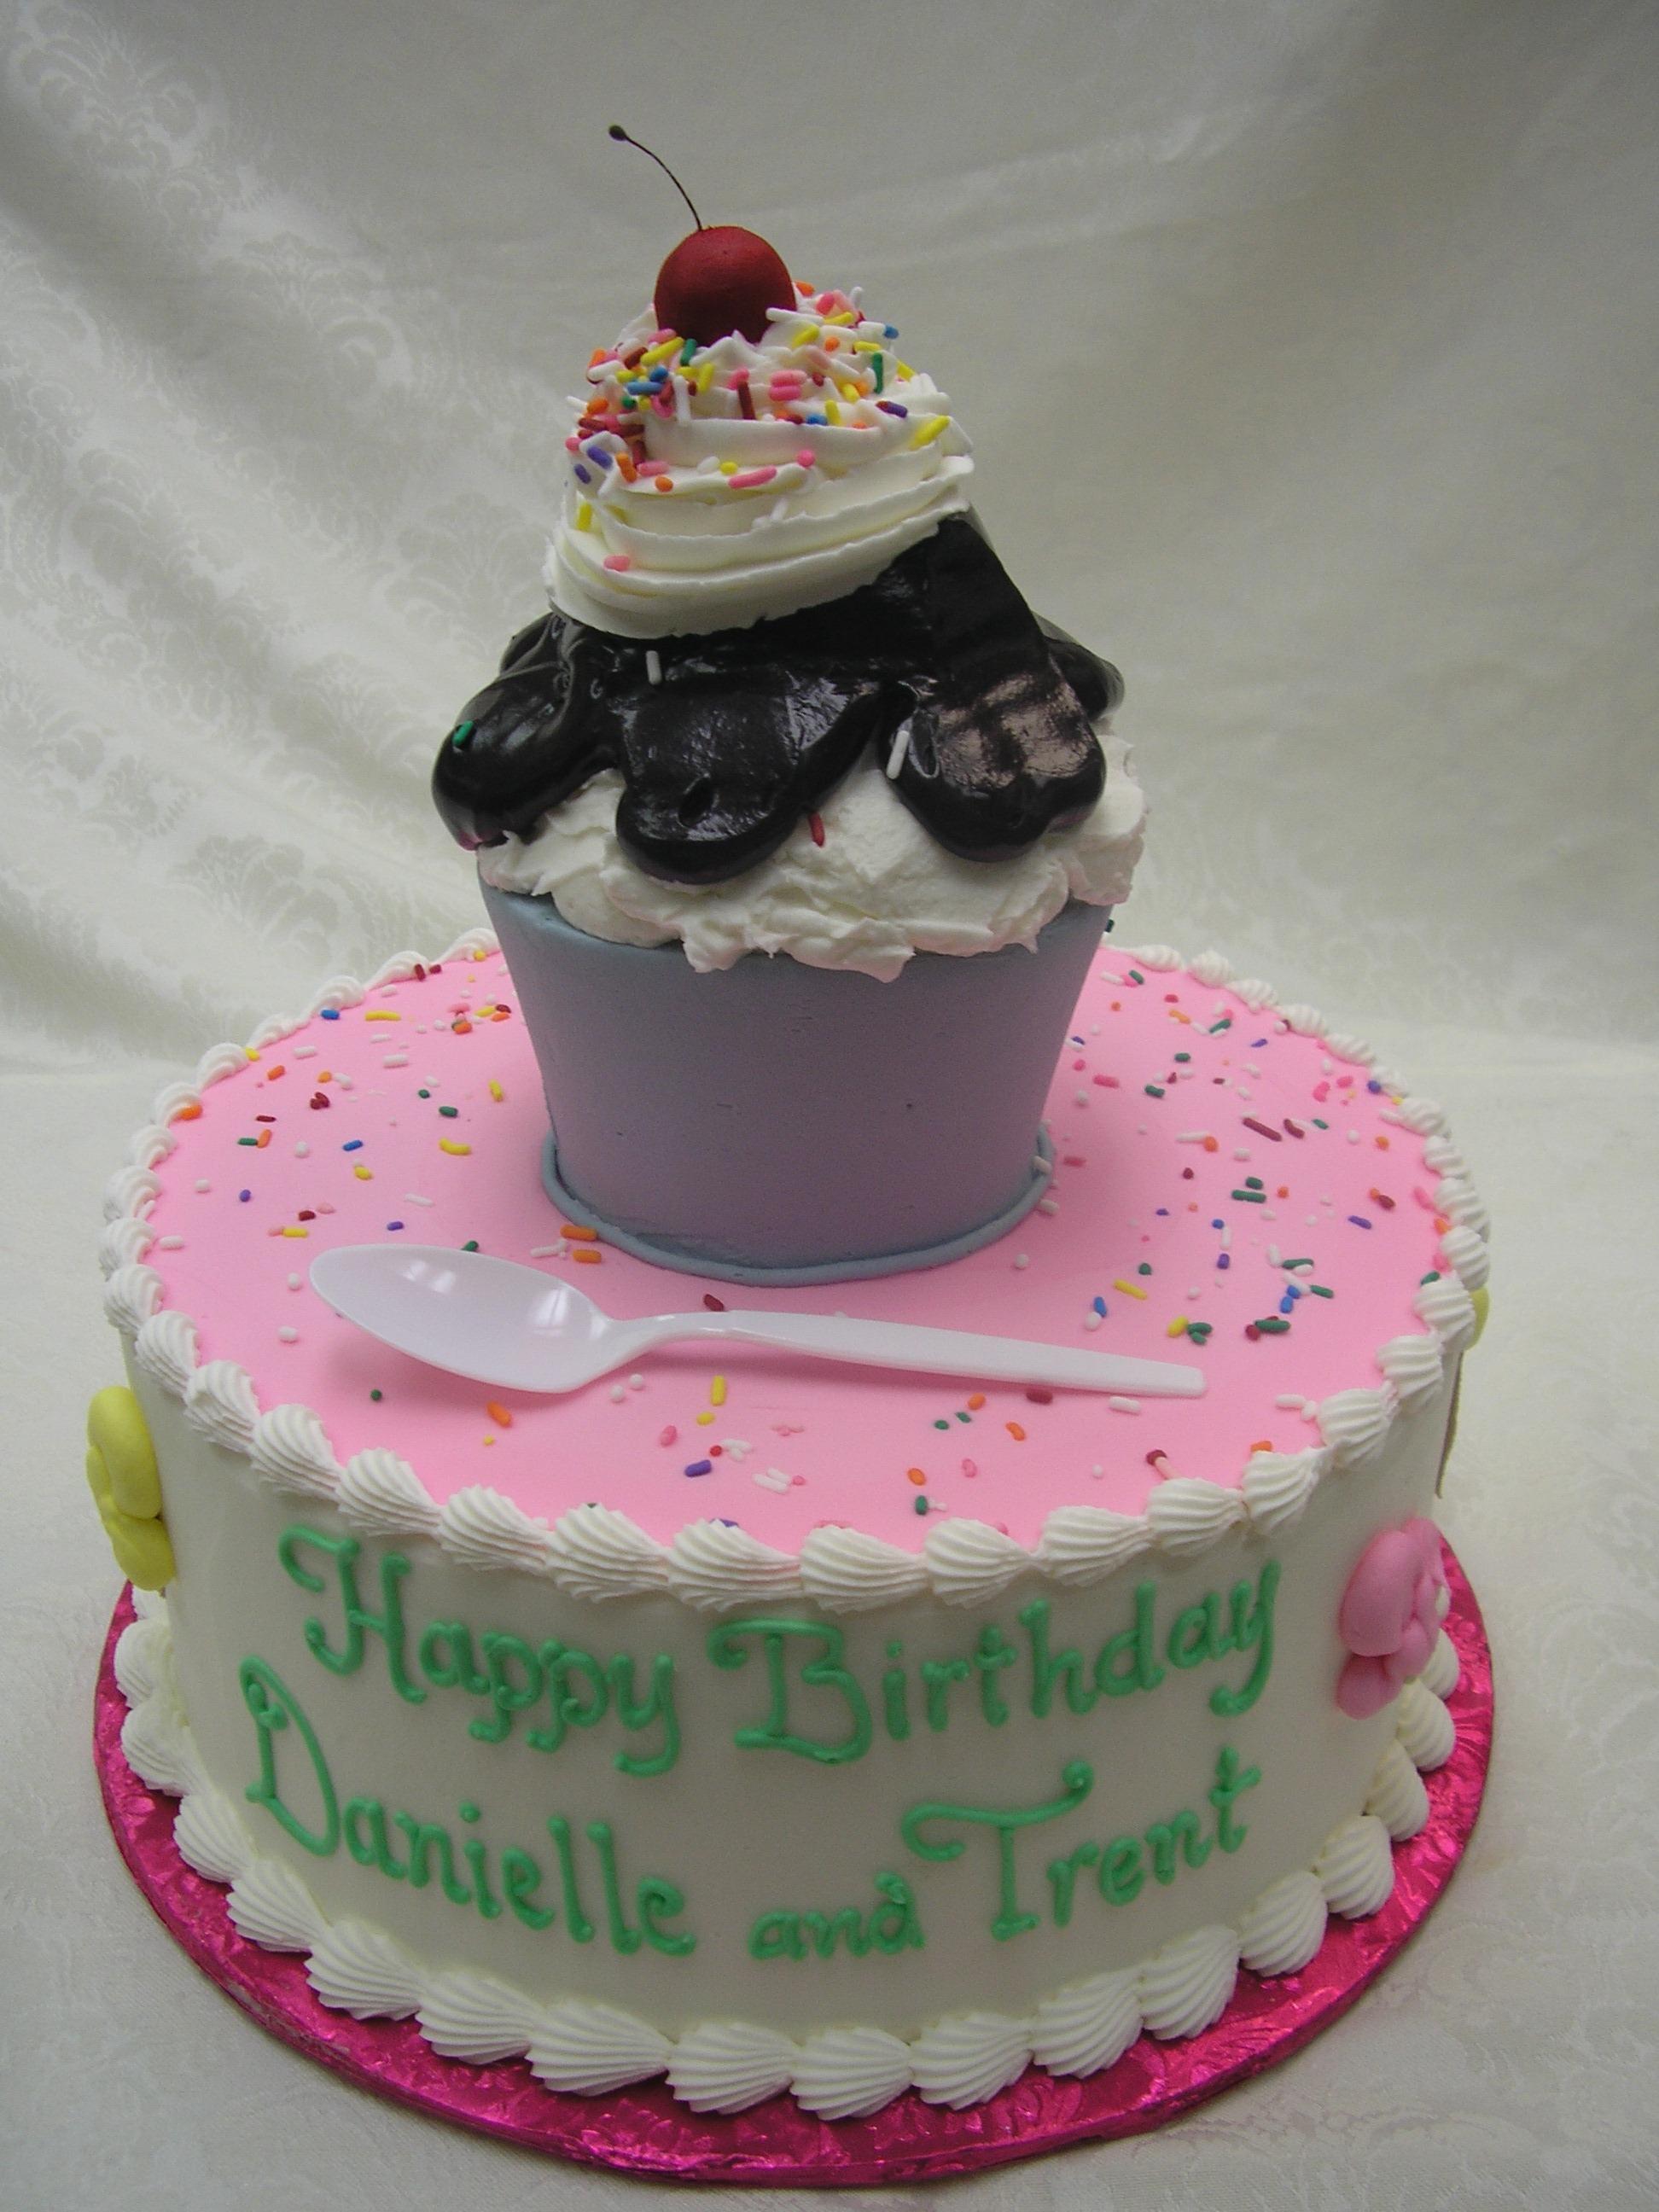 3D ice cream sundae cake